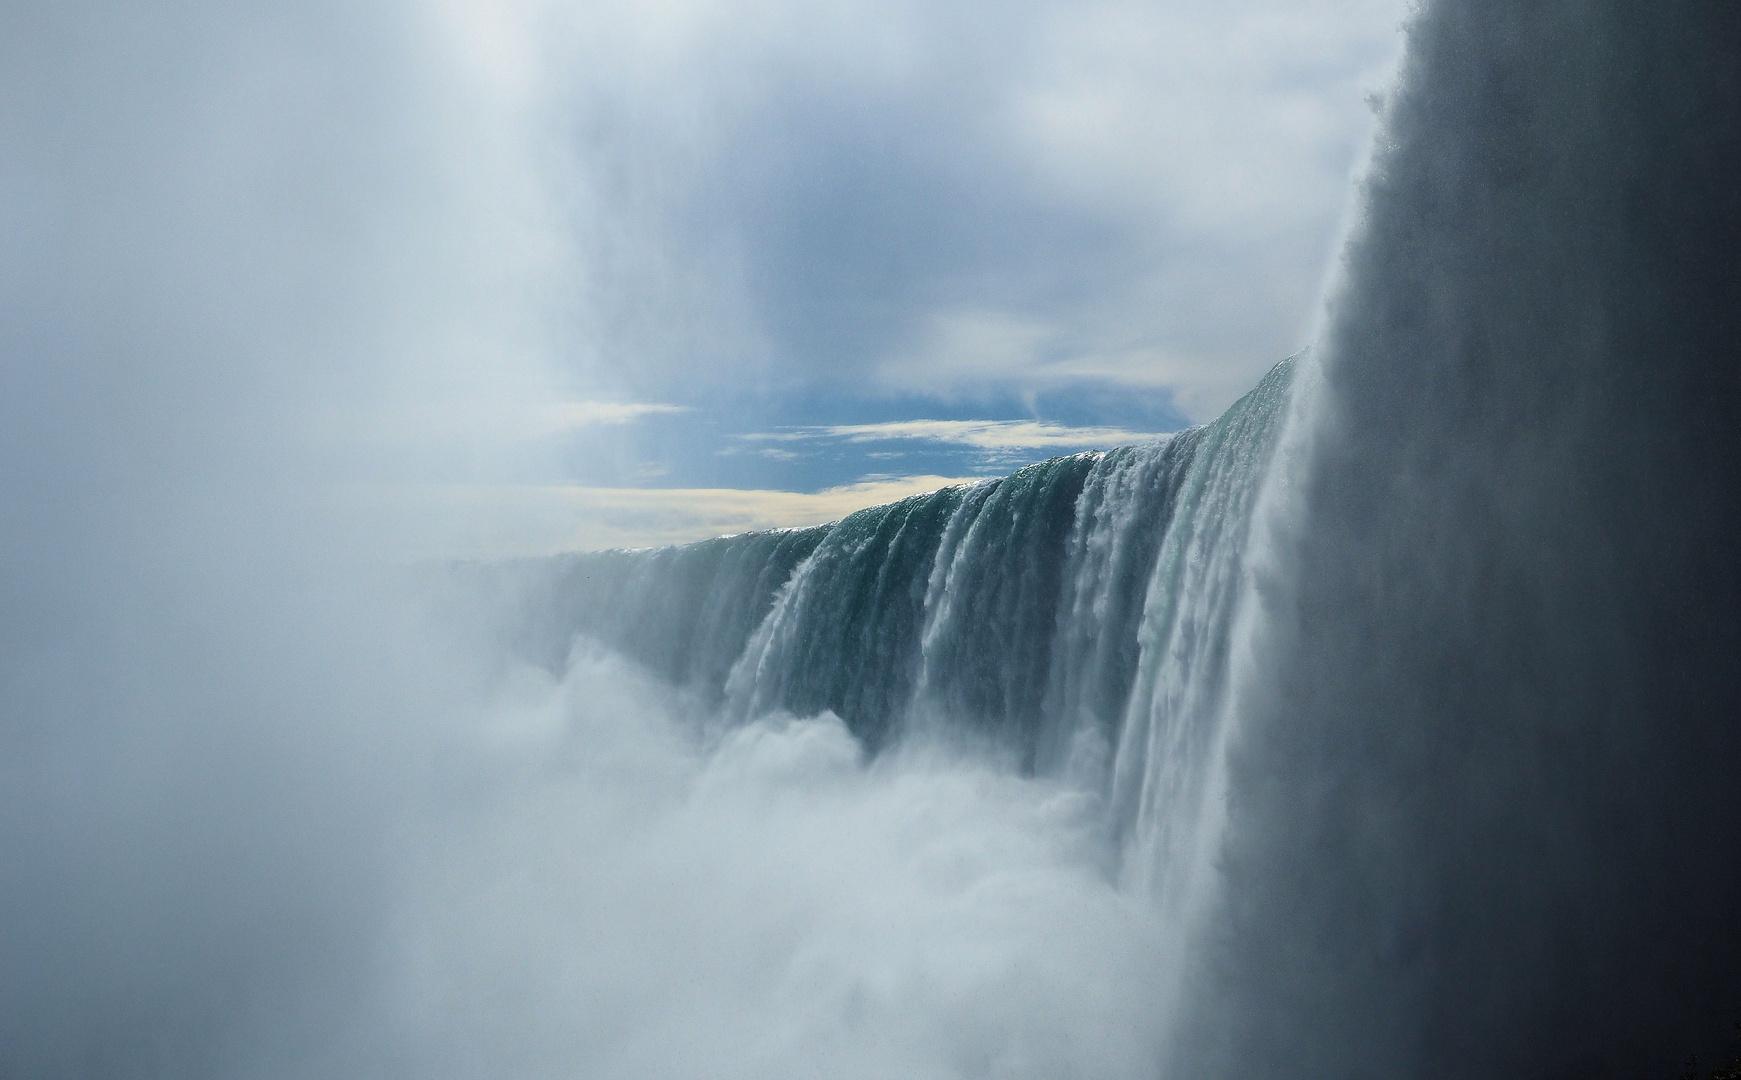 Behind the falls....